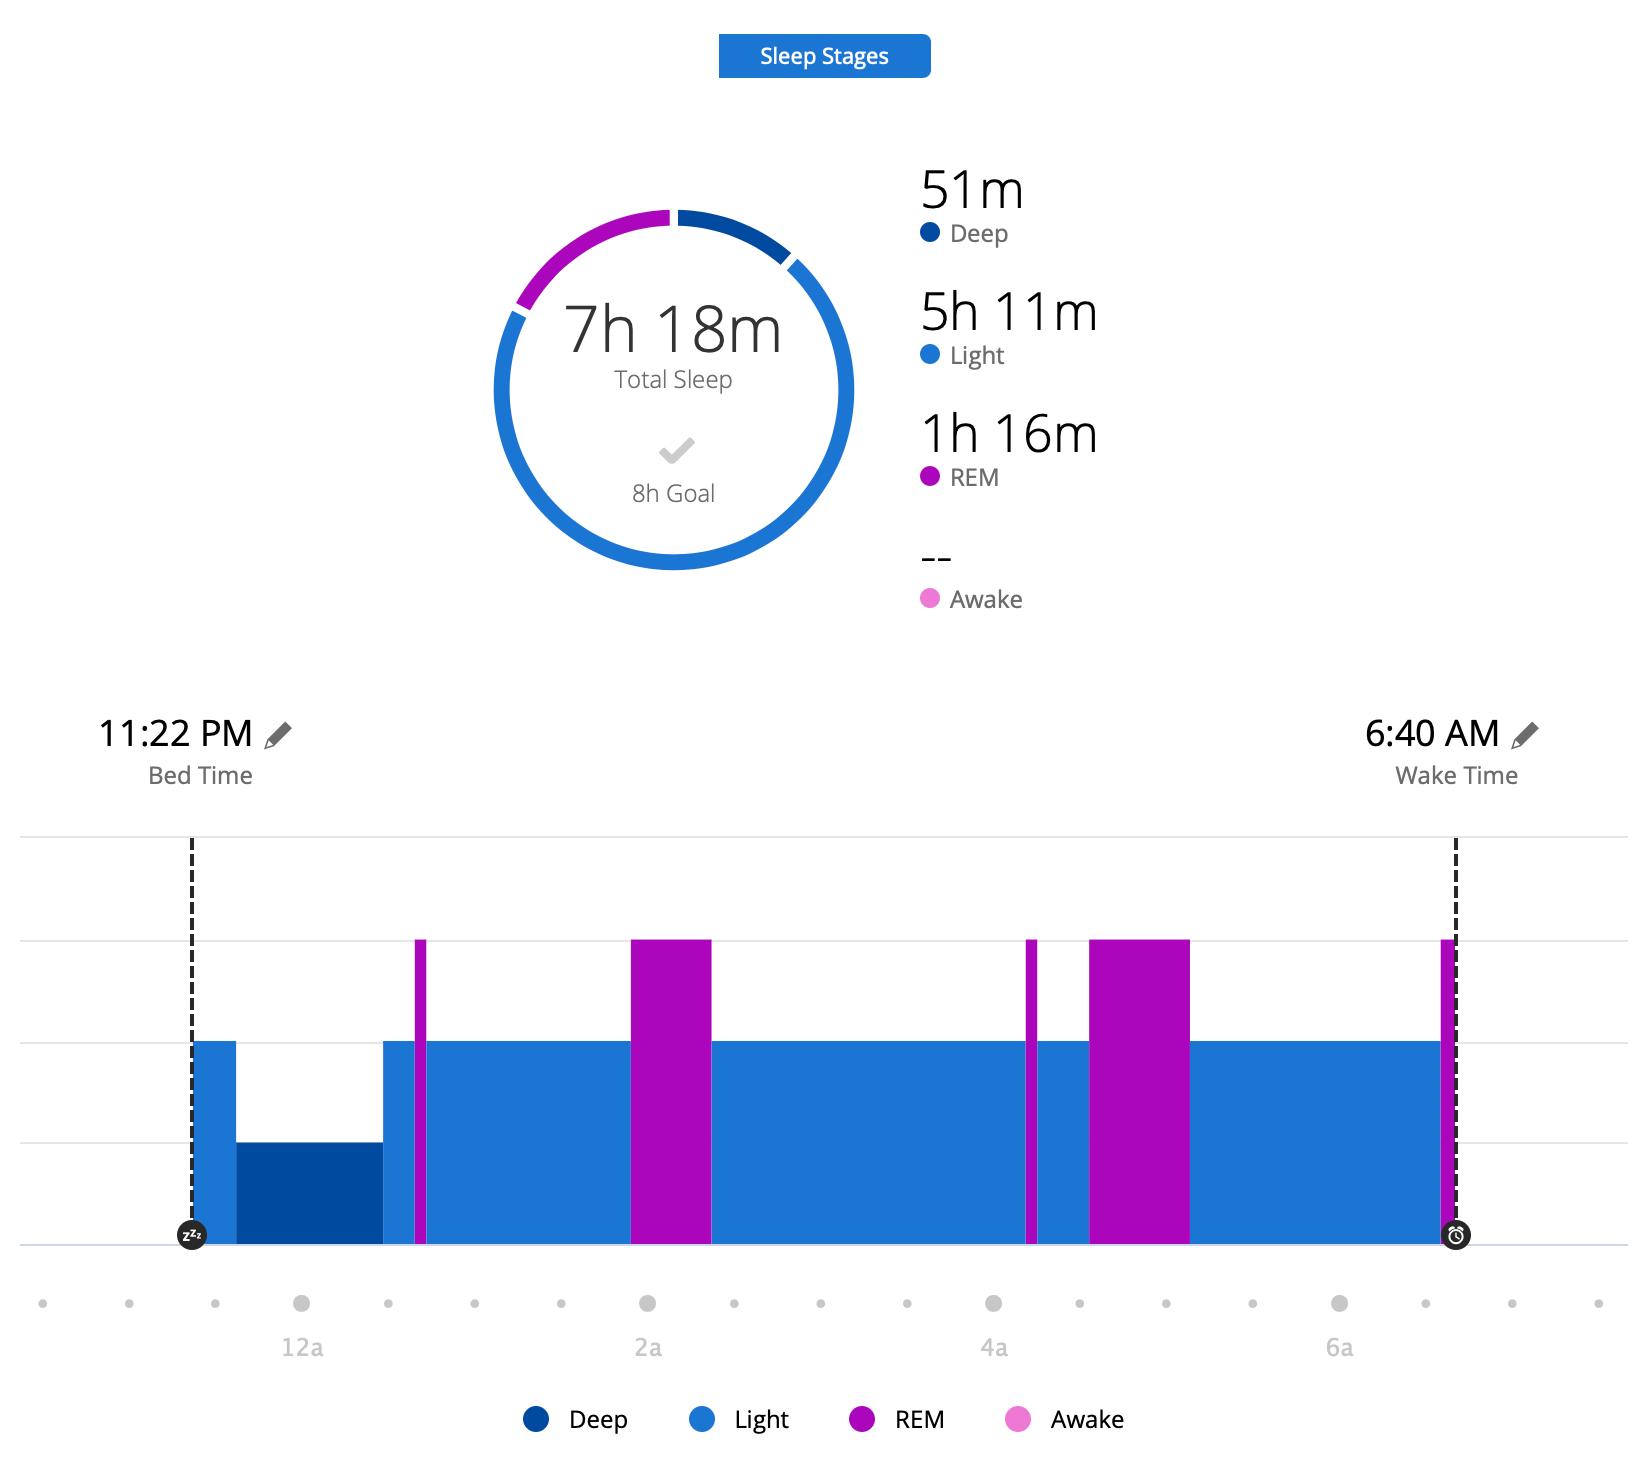 garmin connectでの睡眠計測データ